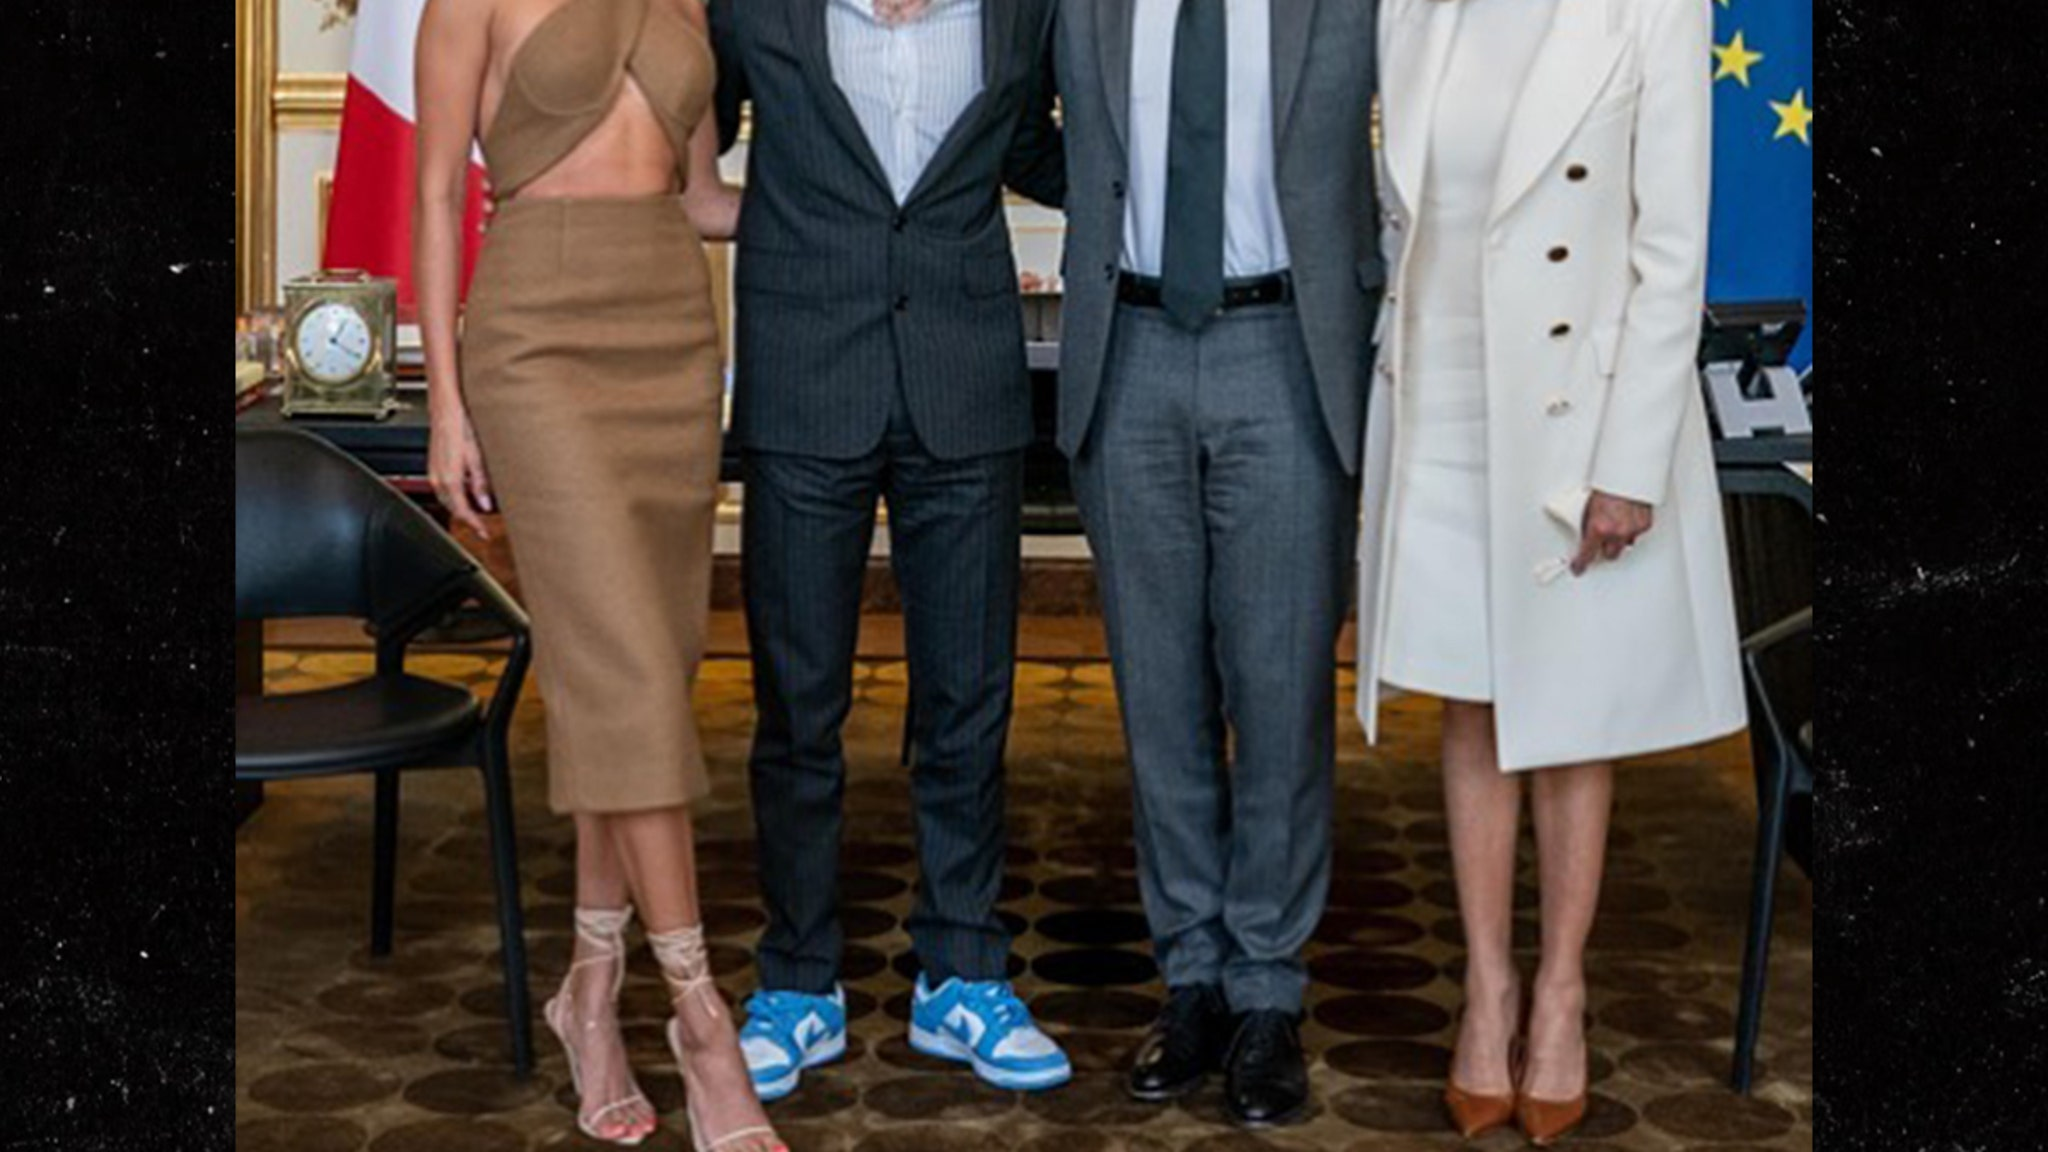 Justin & Hailey Bieber Meet French President Emmanuel Macron - TMZ